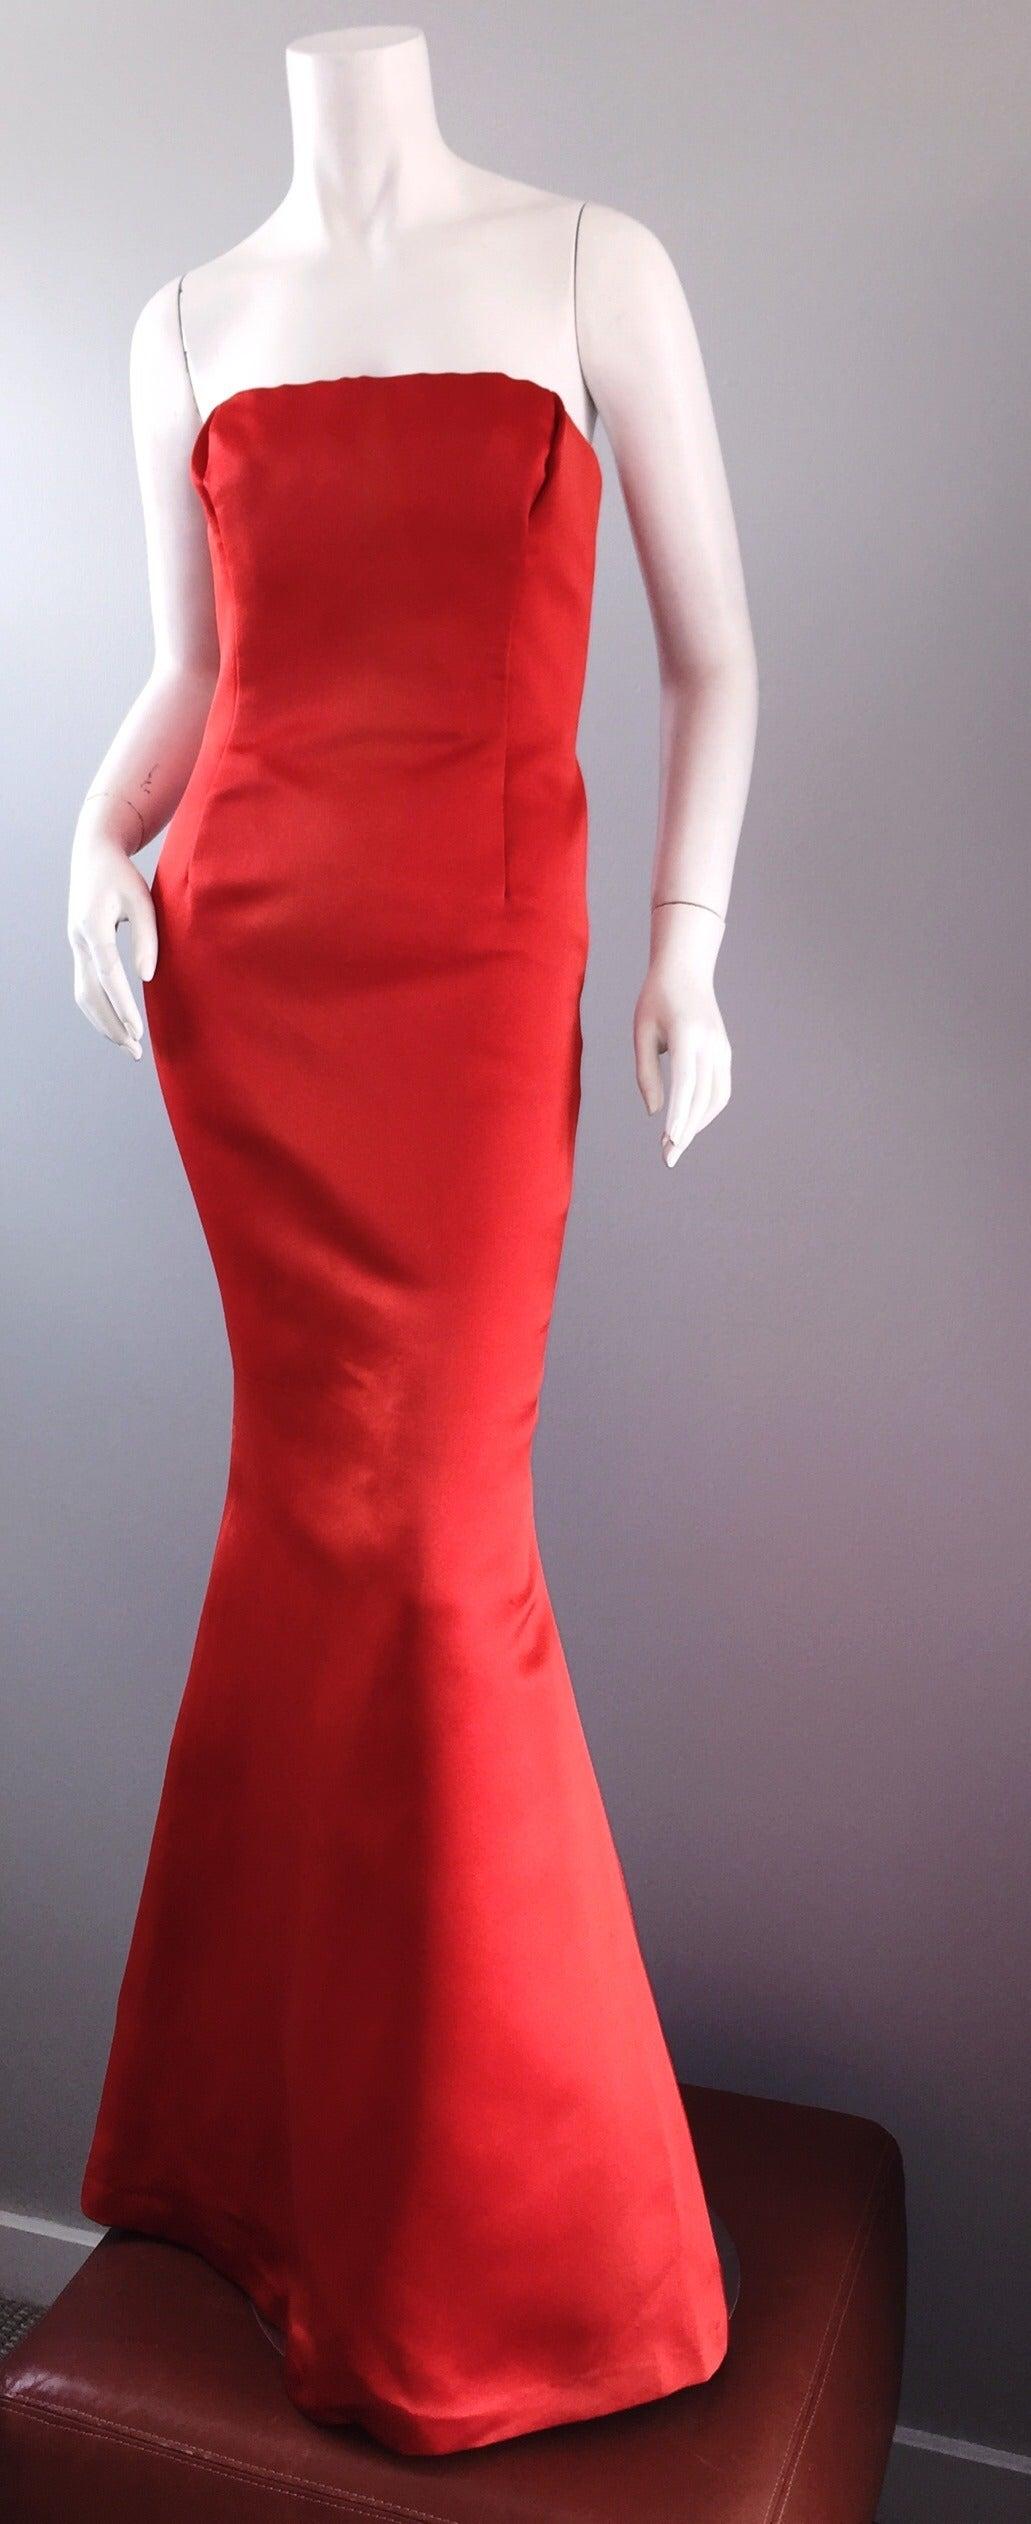 Red Silk Mermaid Dress